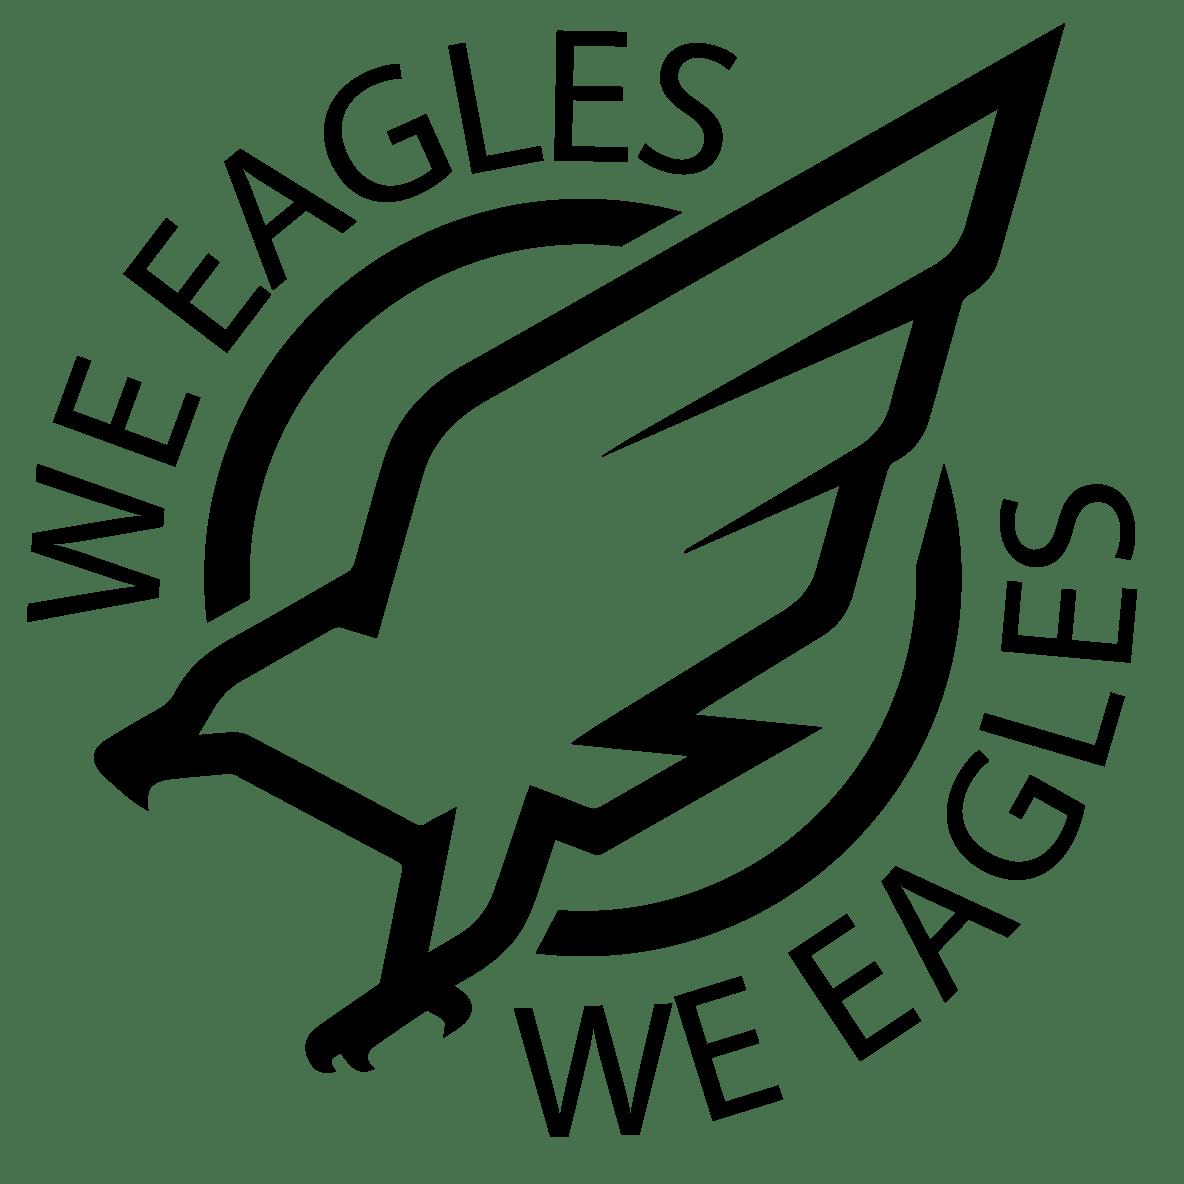 WE EAGLES LTD